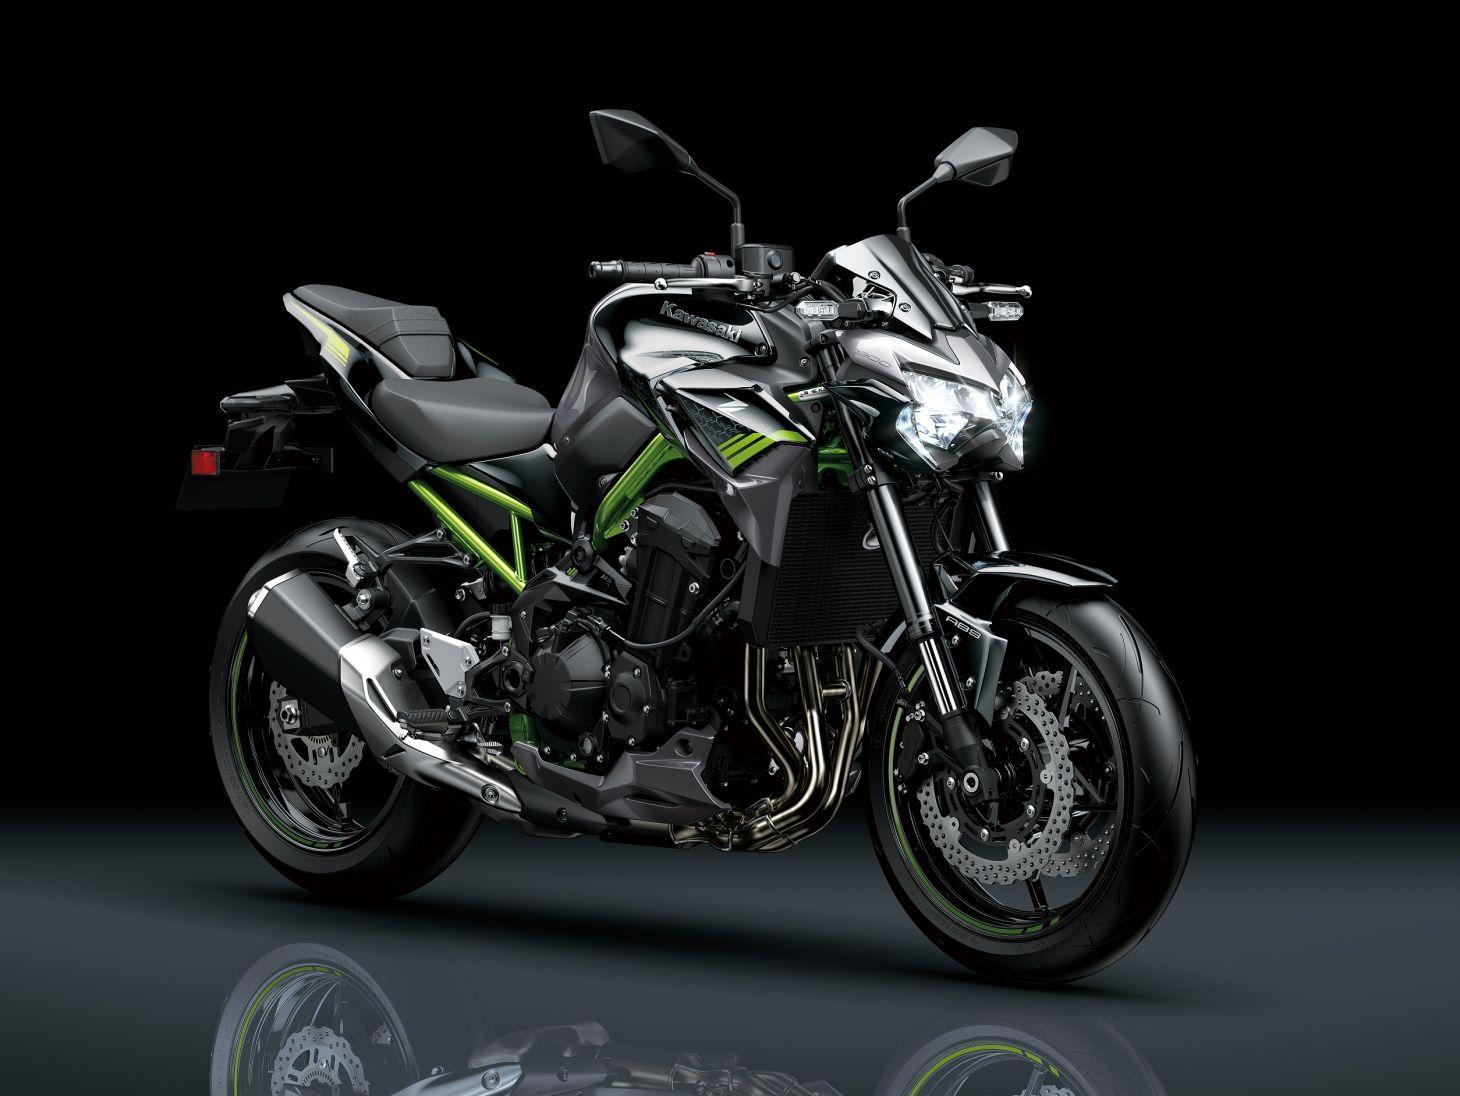 Kawasaki Z 900 2021 preta de frente